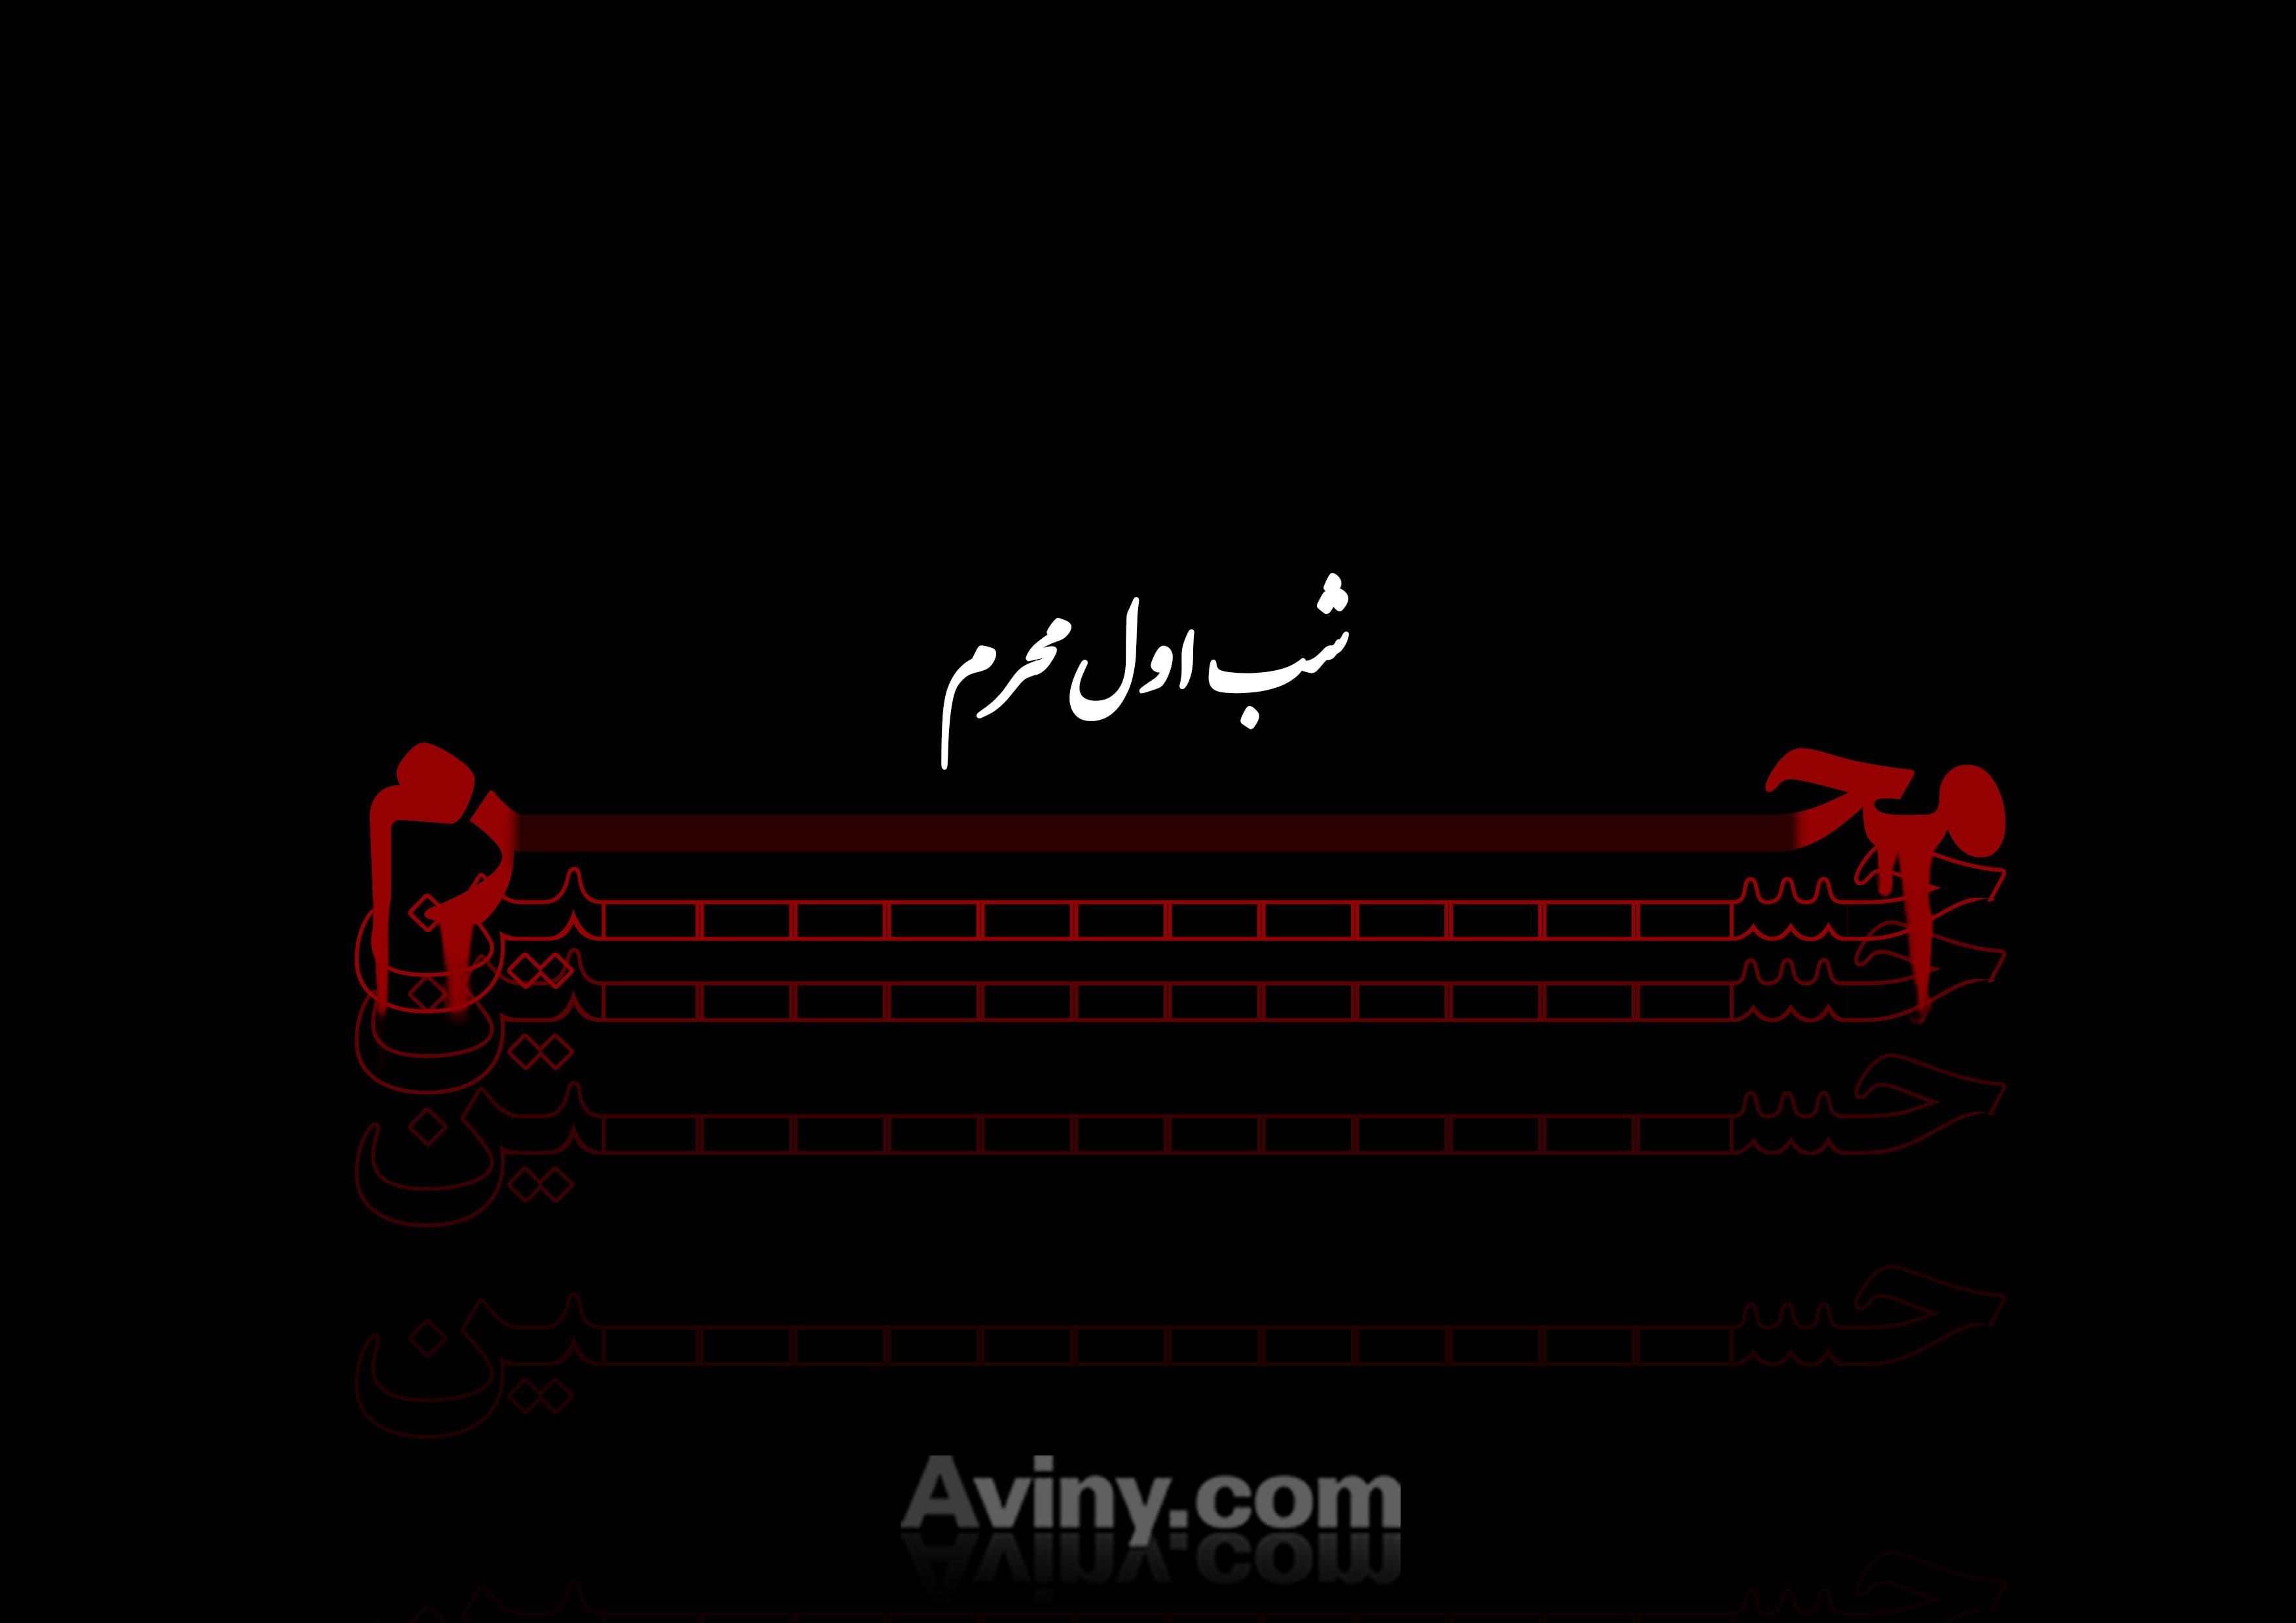 کلیپ شب اول محرم - حاج میثم مطیعی